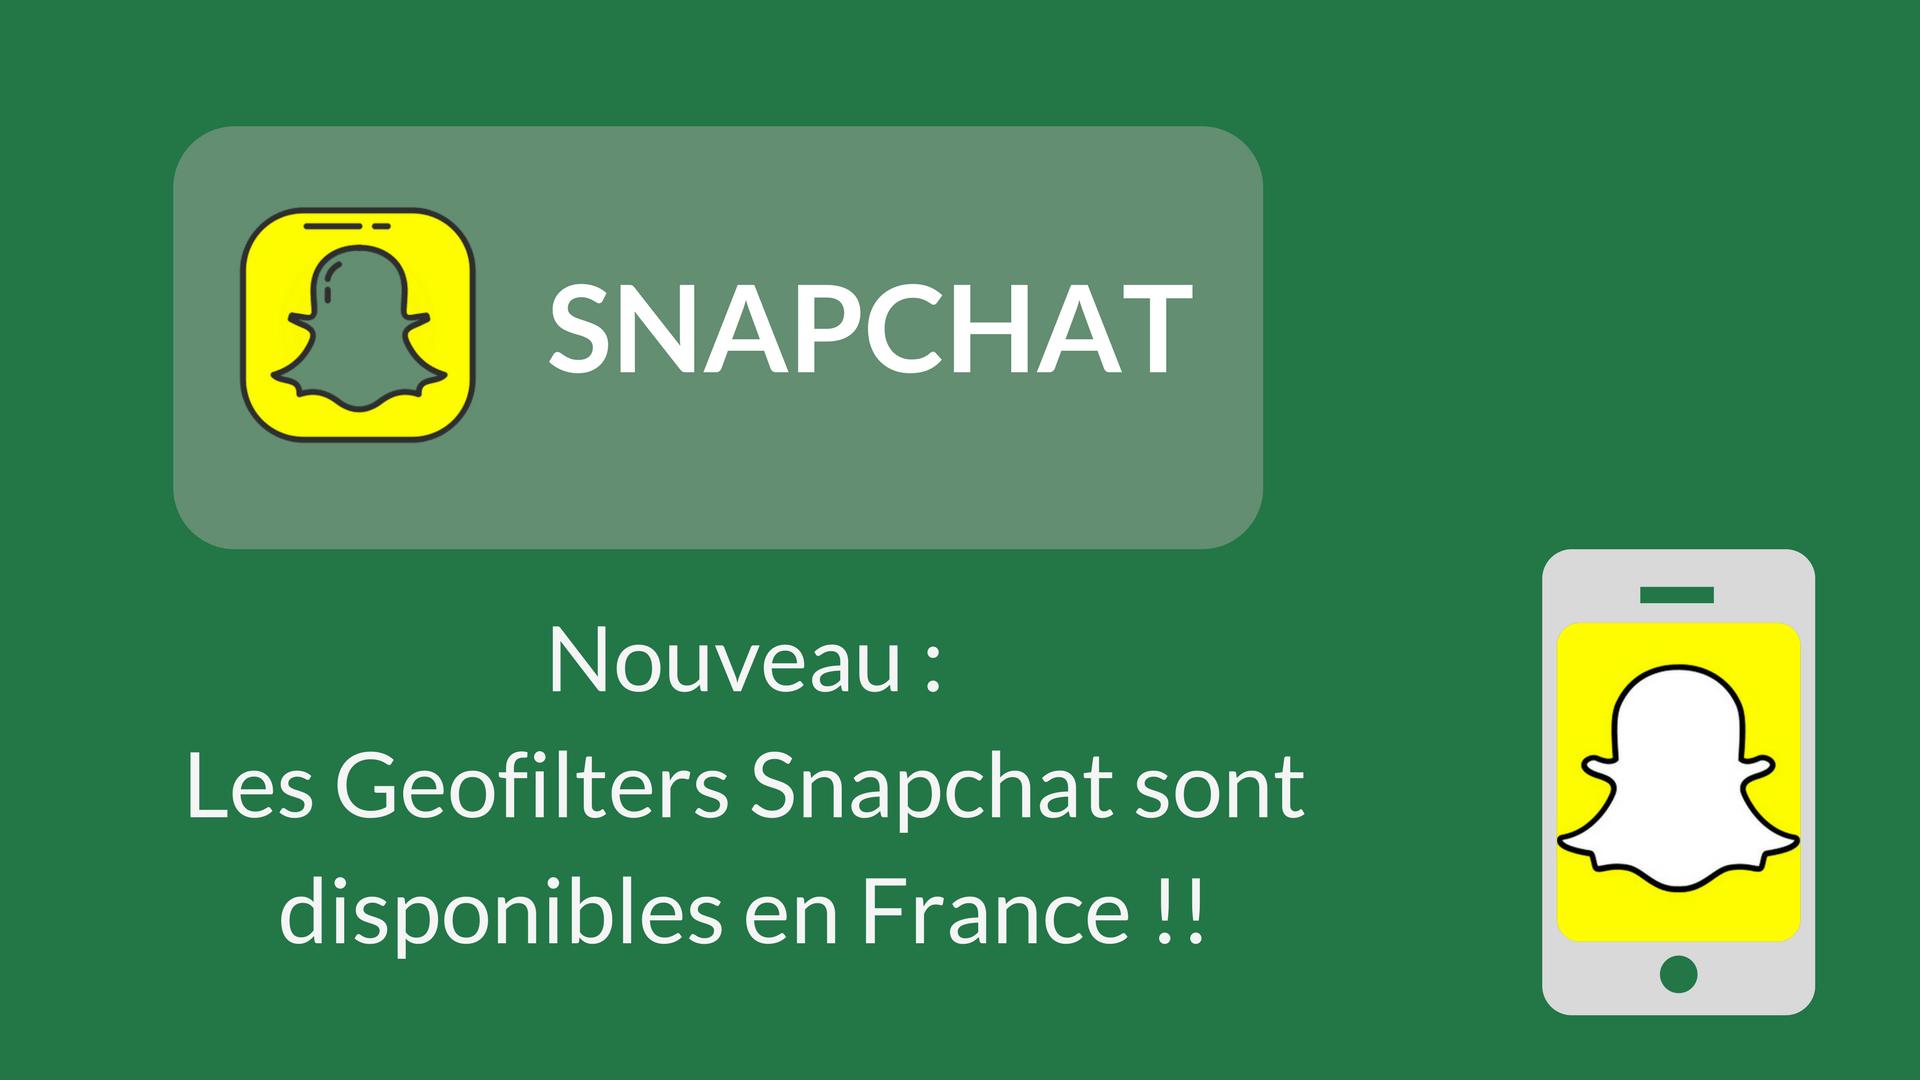 Snapchat-geofiletrs